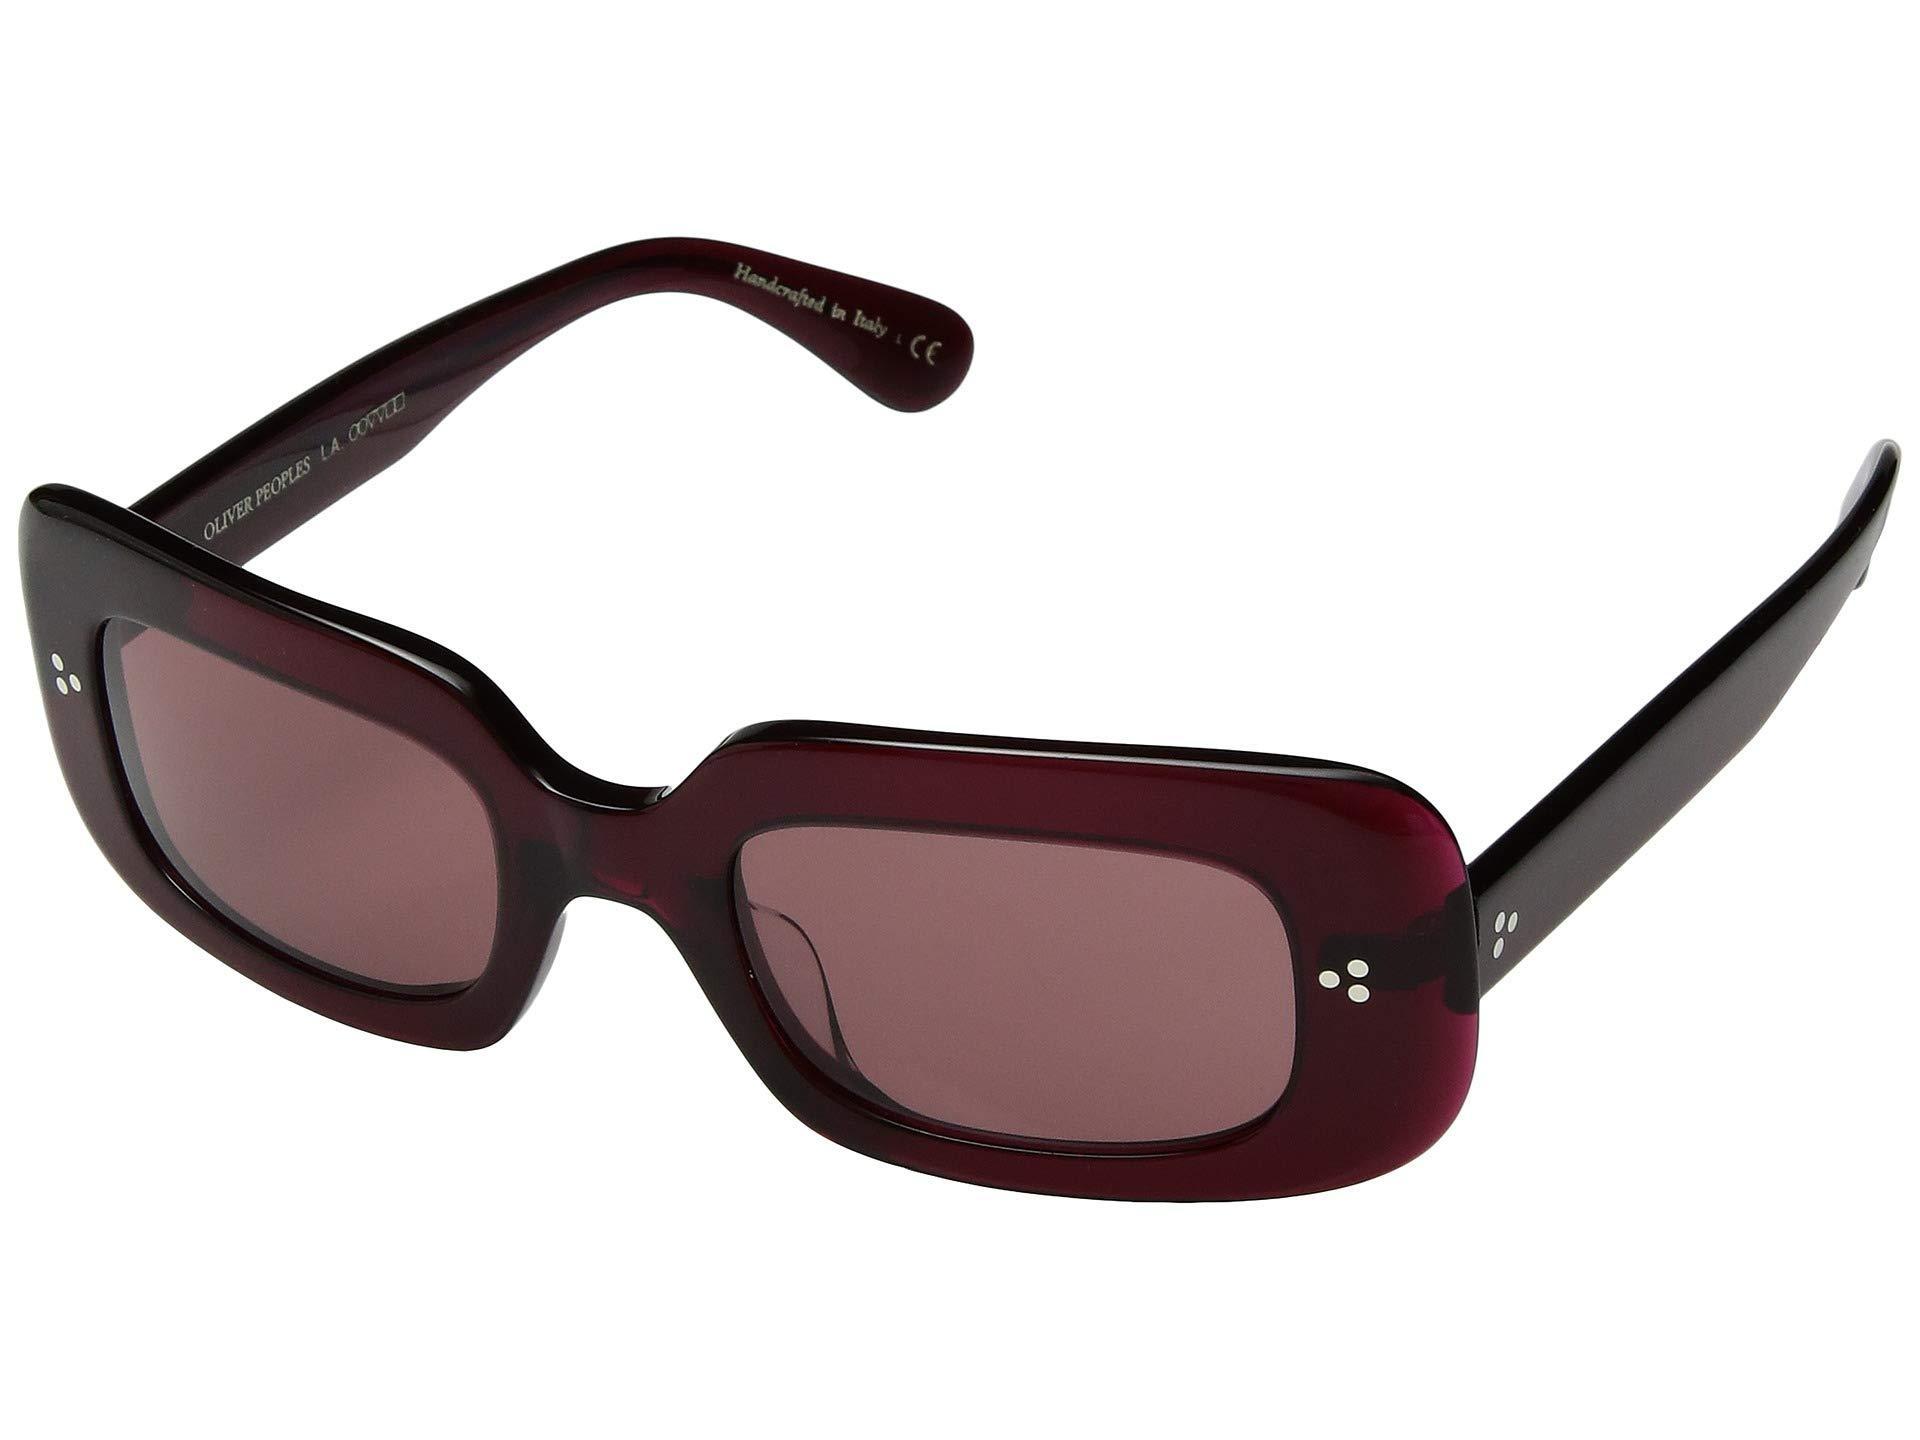 c03d89209234 Lyst - Oliver Peoples Saurine (deep Burgundy damson Lens) Fashion ...